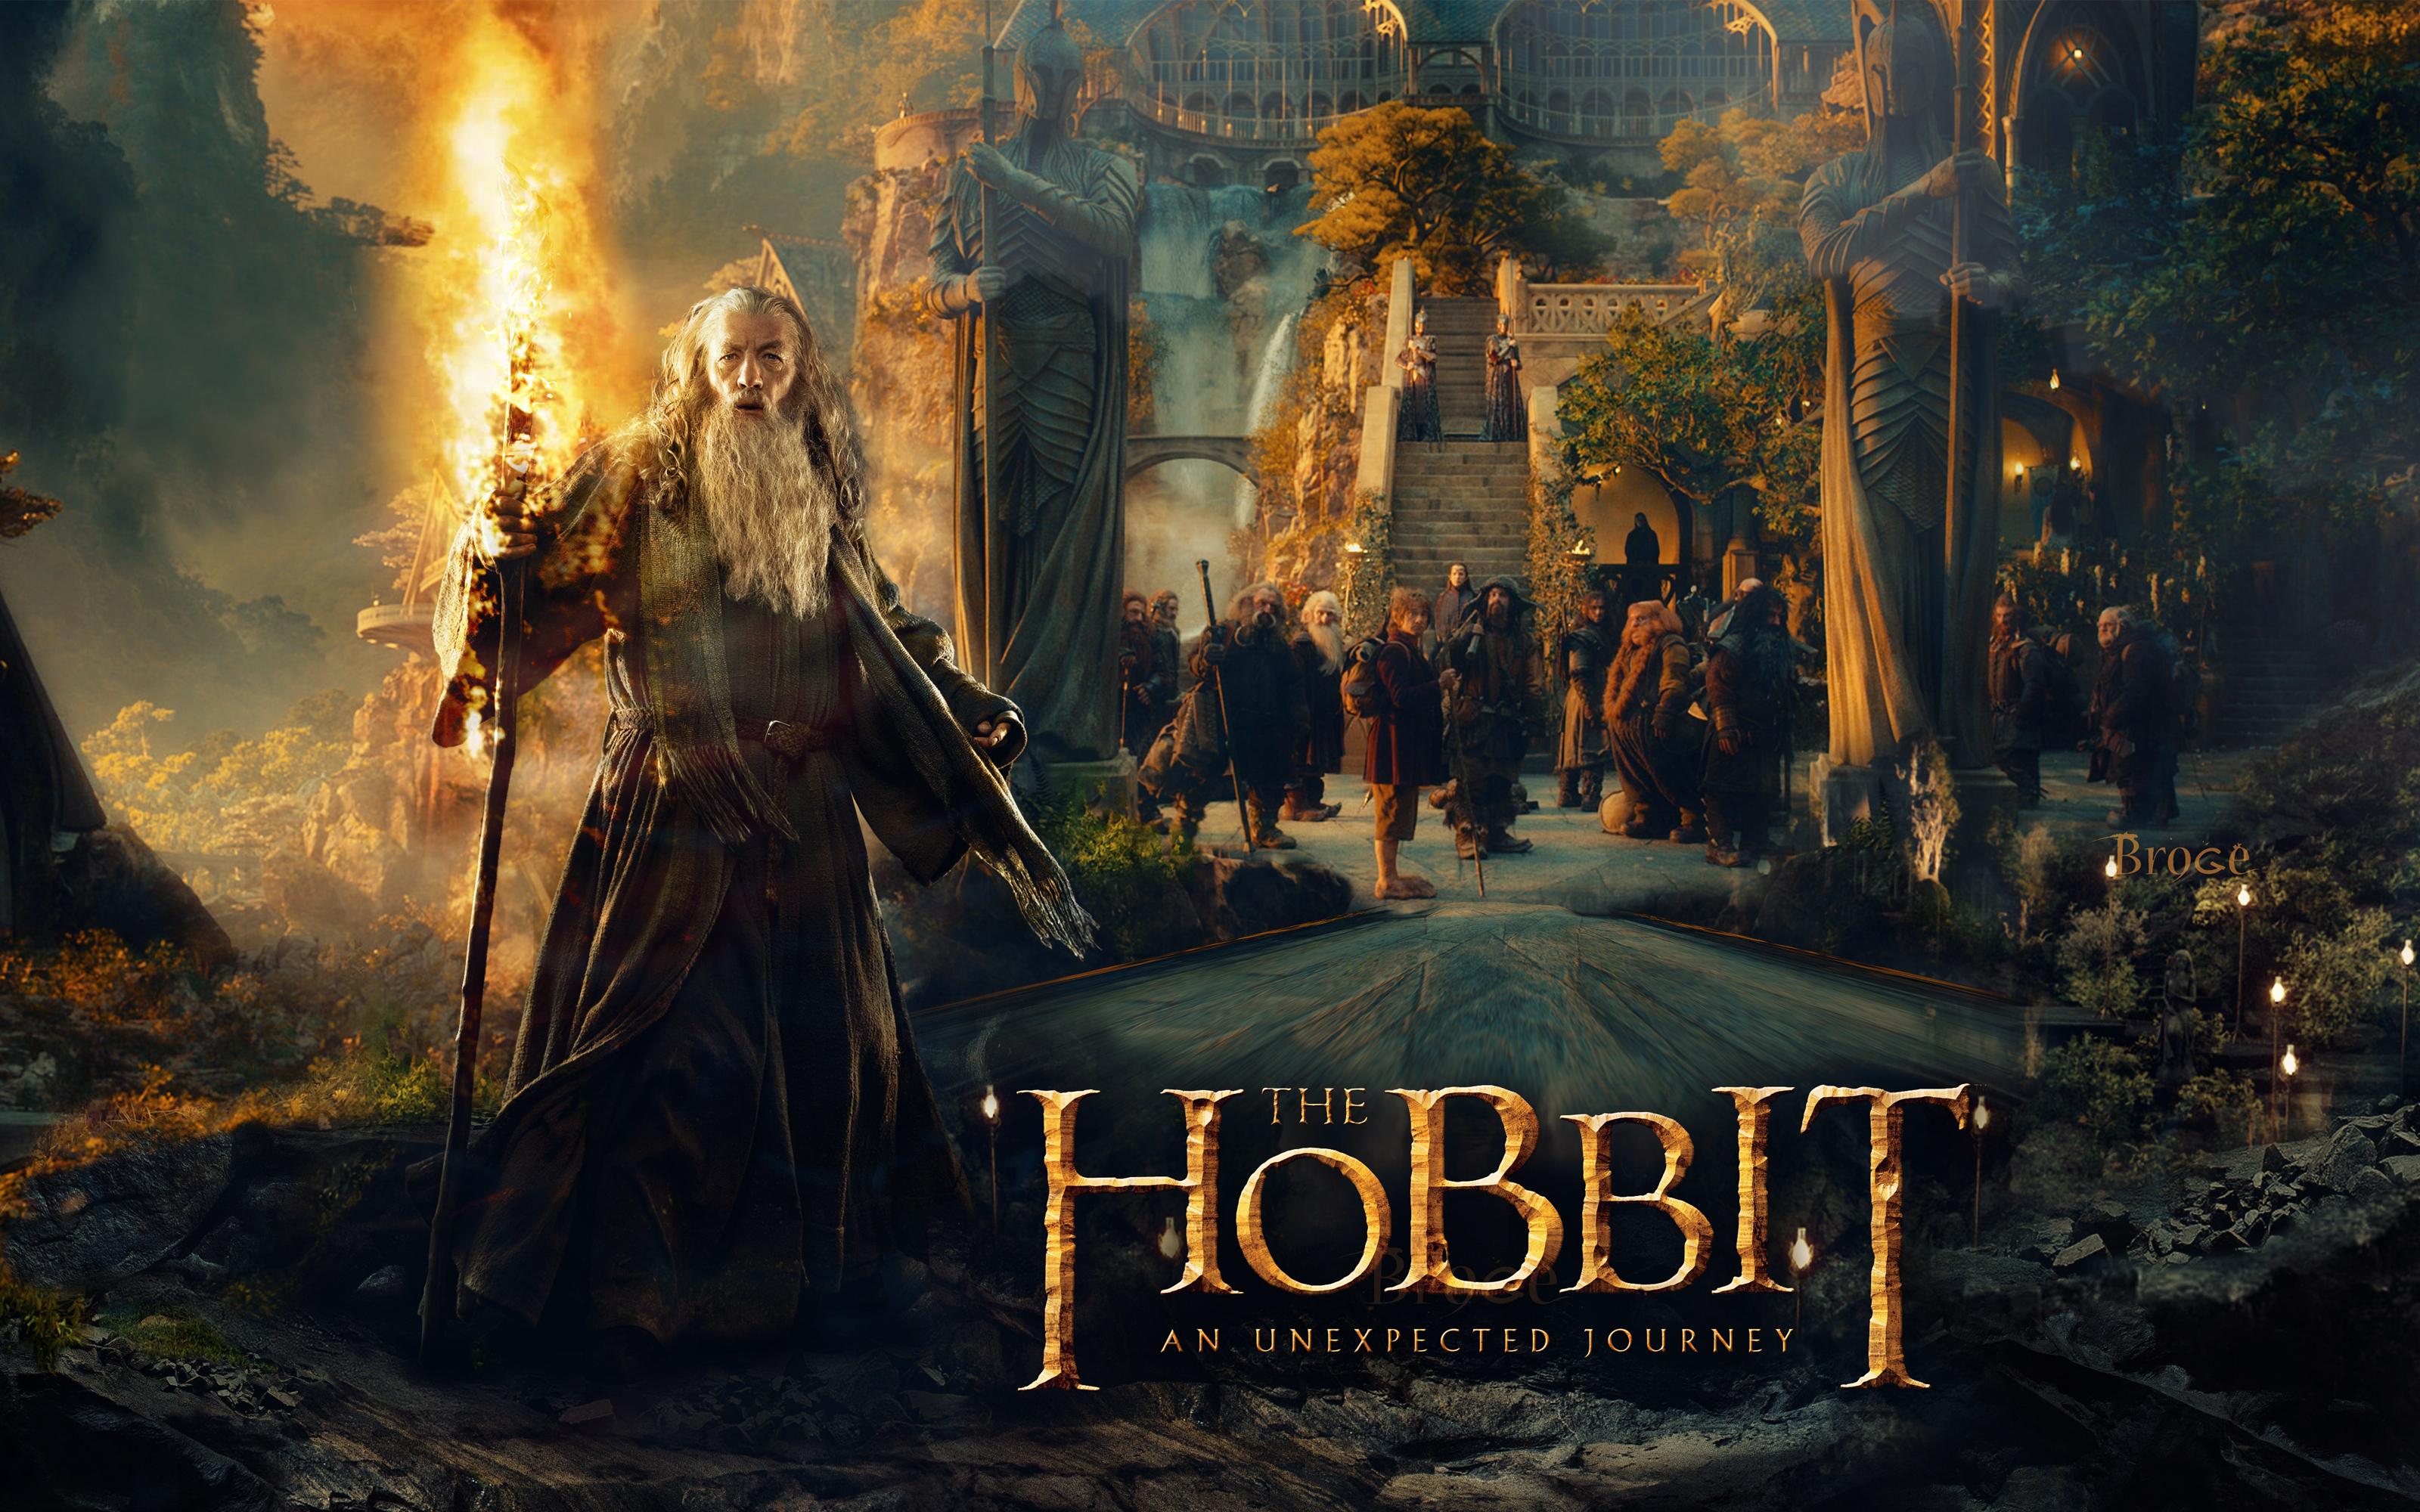 Hobbit unexpected journey seems